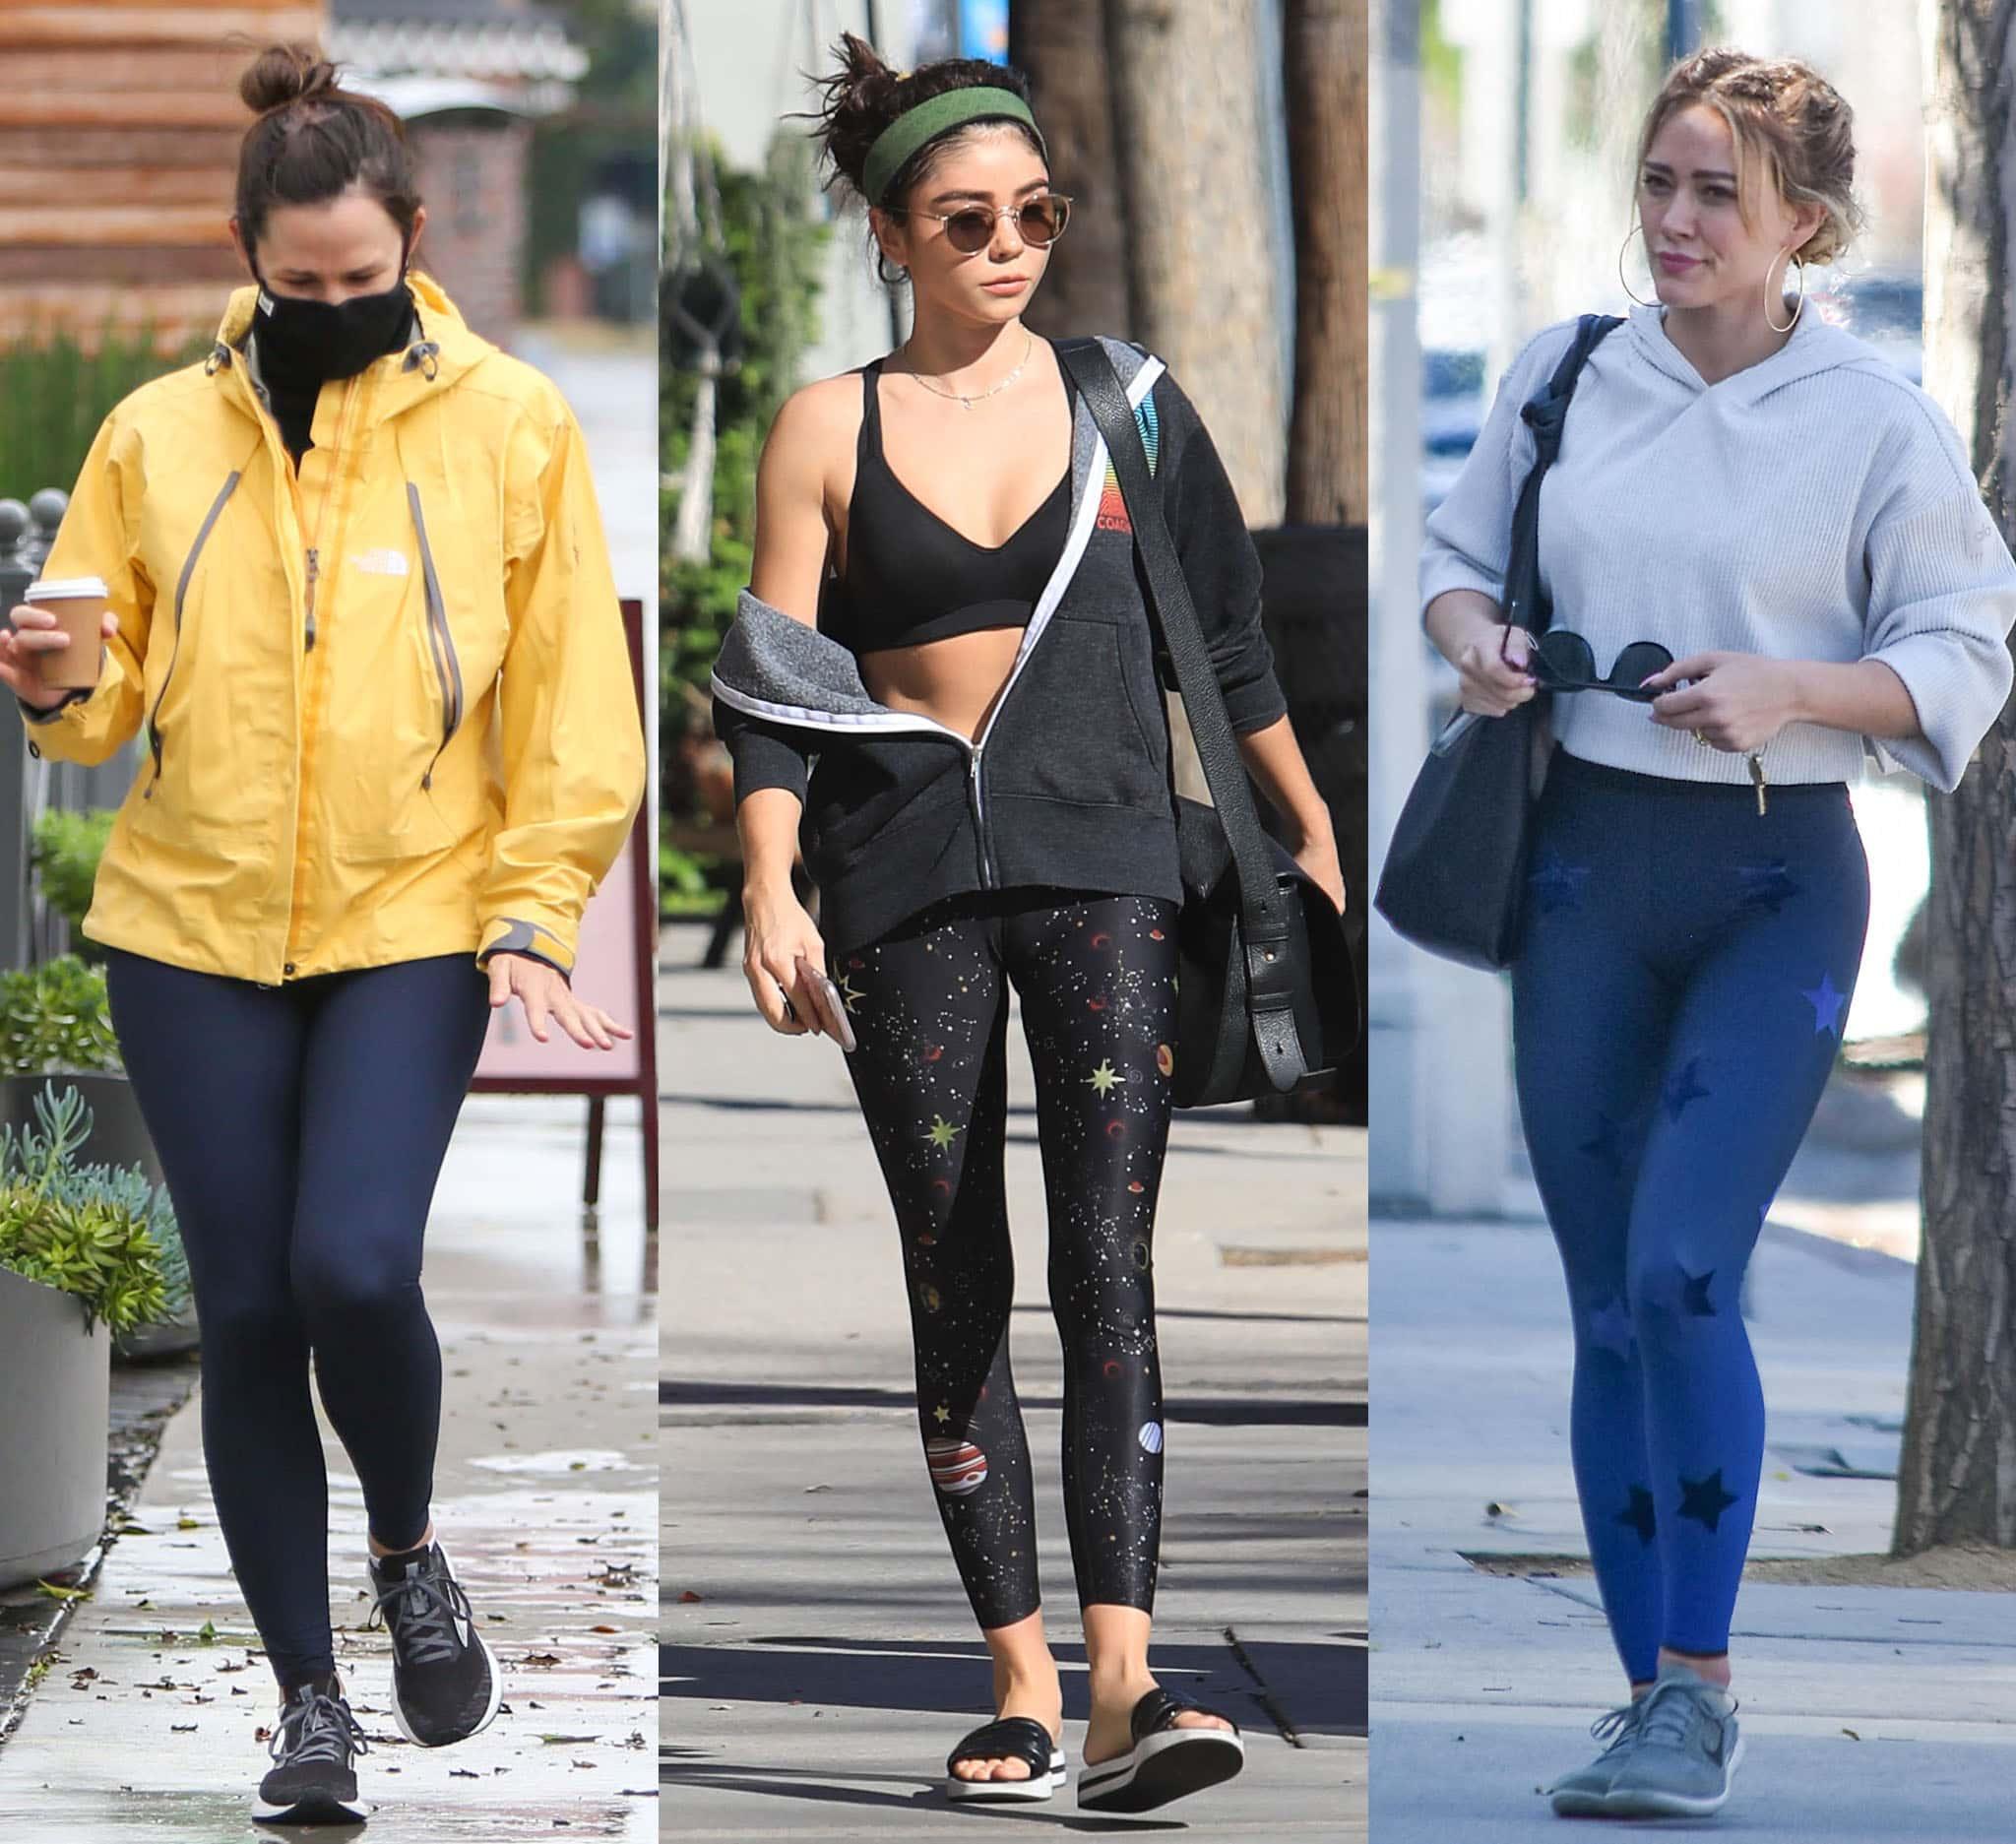 Jennifer Garner, Sarah Hyland, and Hilary Duff go for athleisure looks in leggings